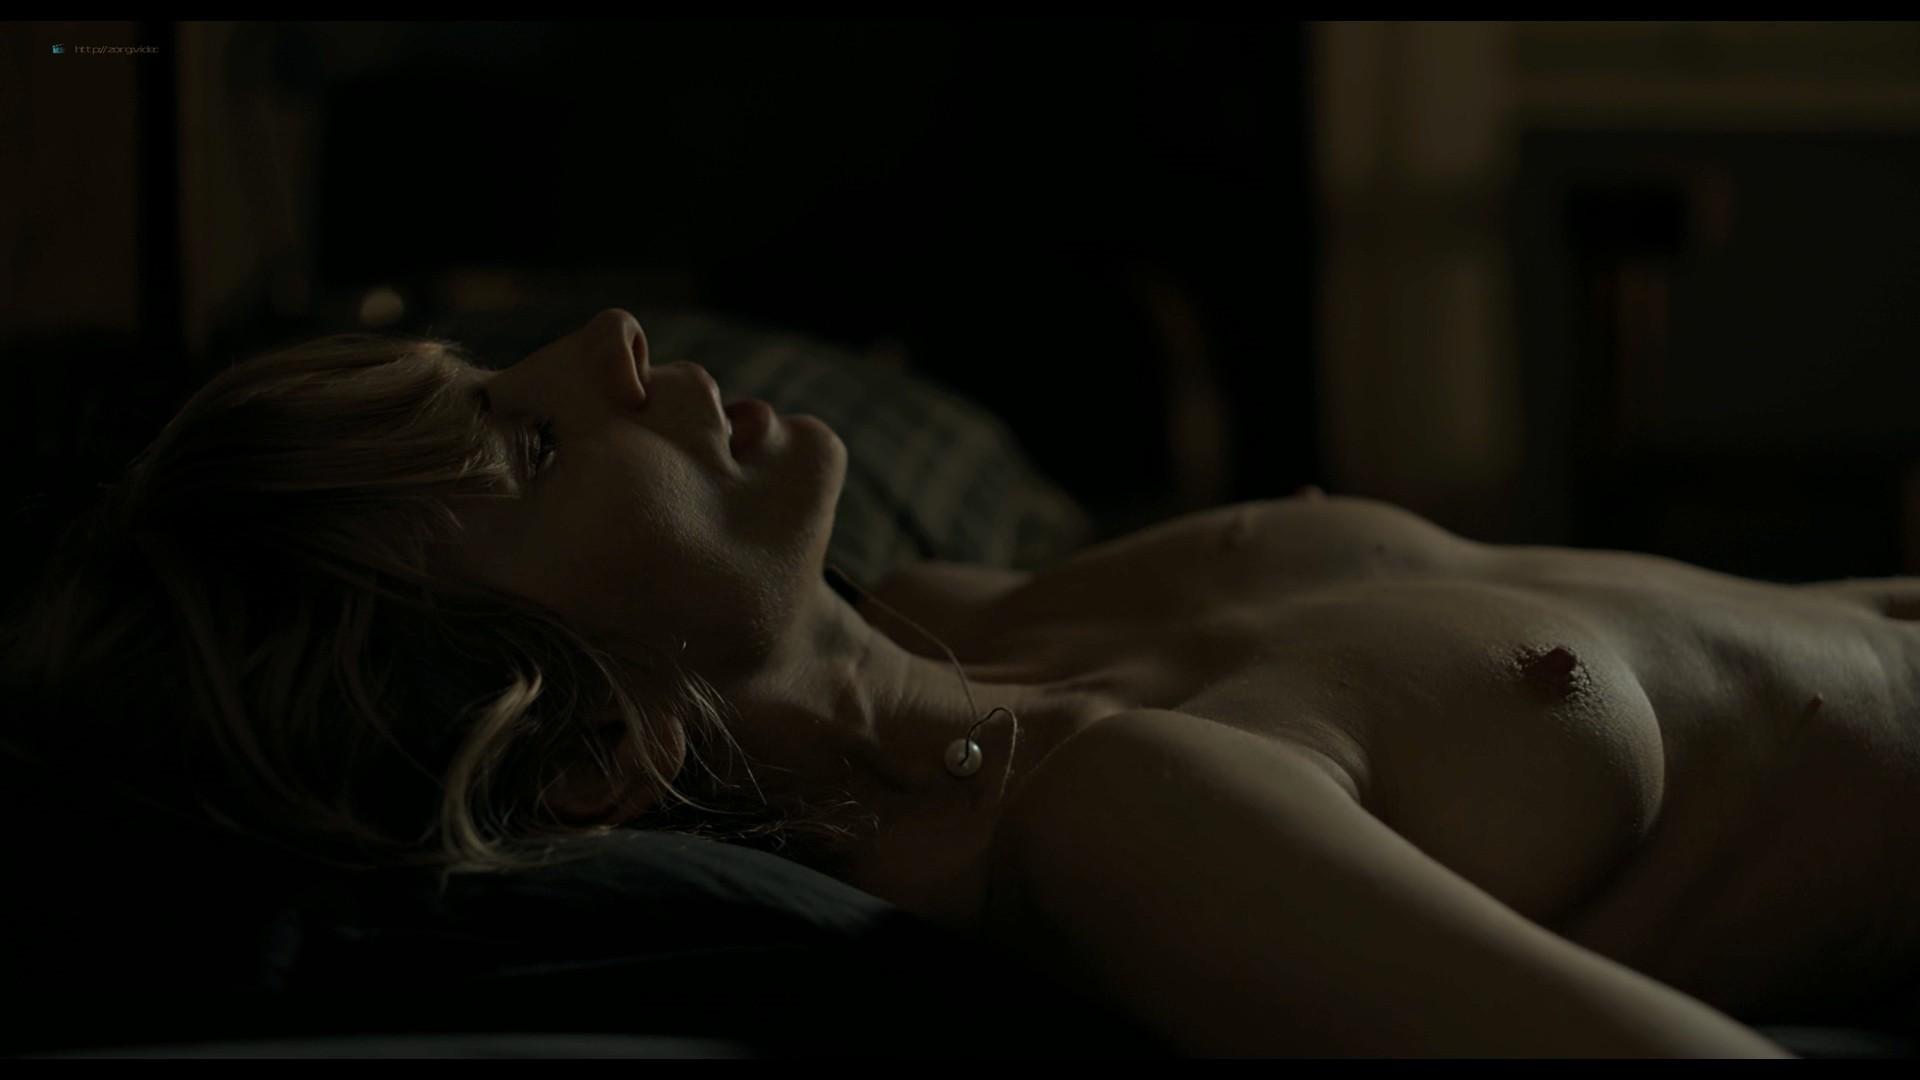 Magdalena Cielecka nude sex Roma Gasiorowska nude too - Dark, Almost Night (PL-2019) HD 1080p BluRay (2)